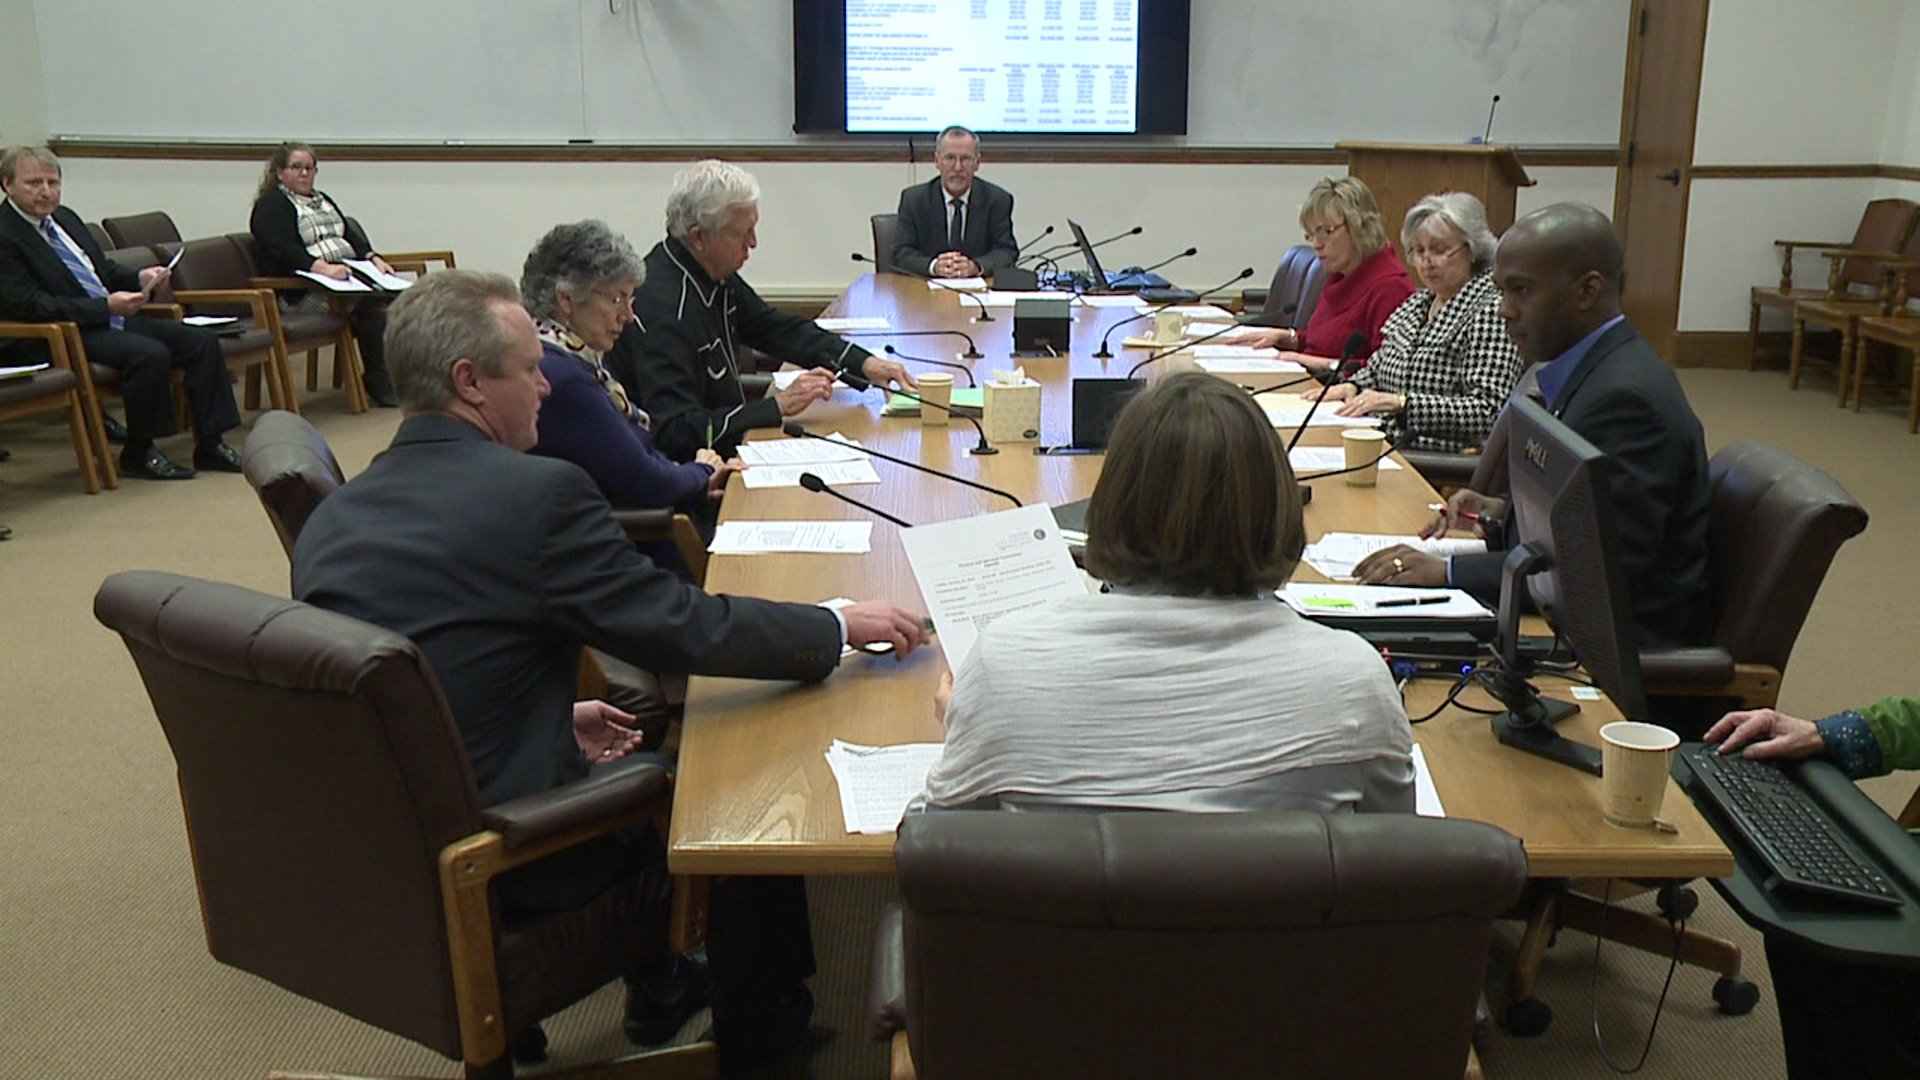 Denver City Council considers pay raise for itself